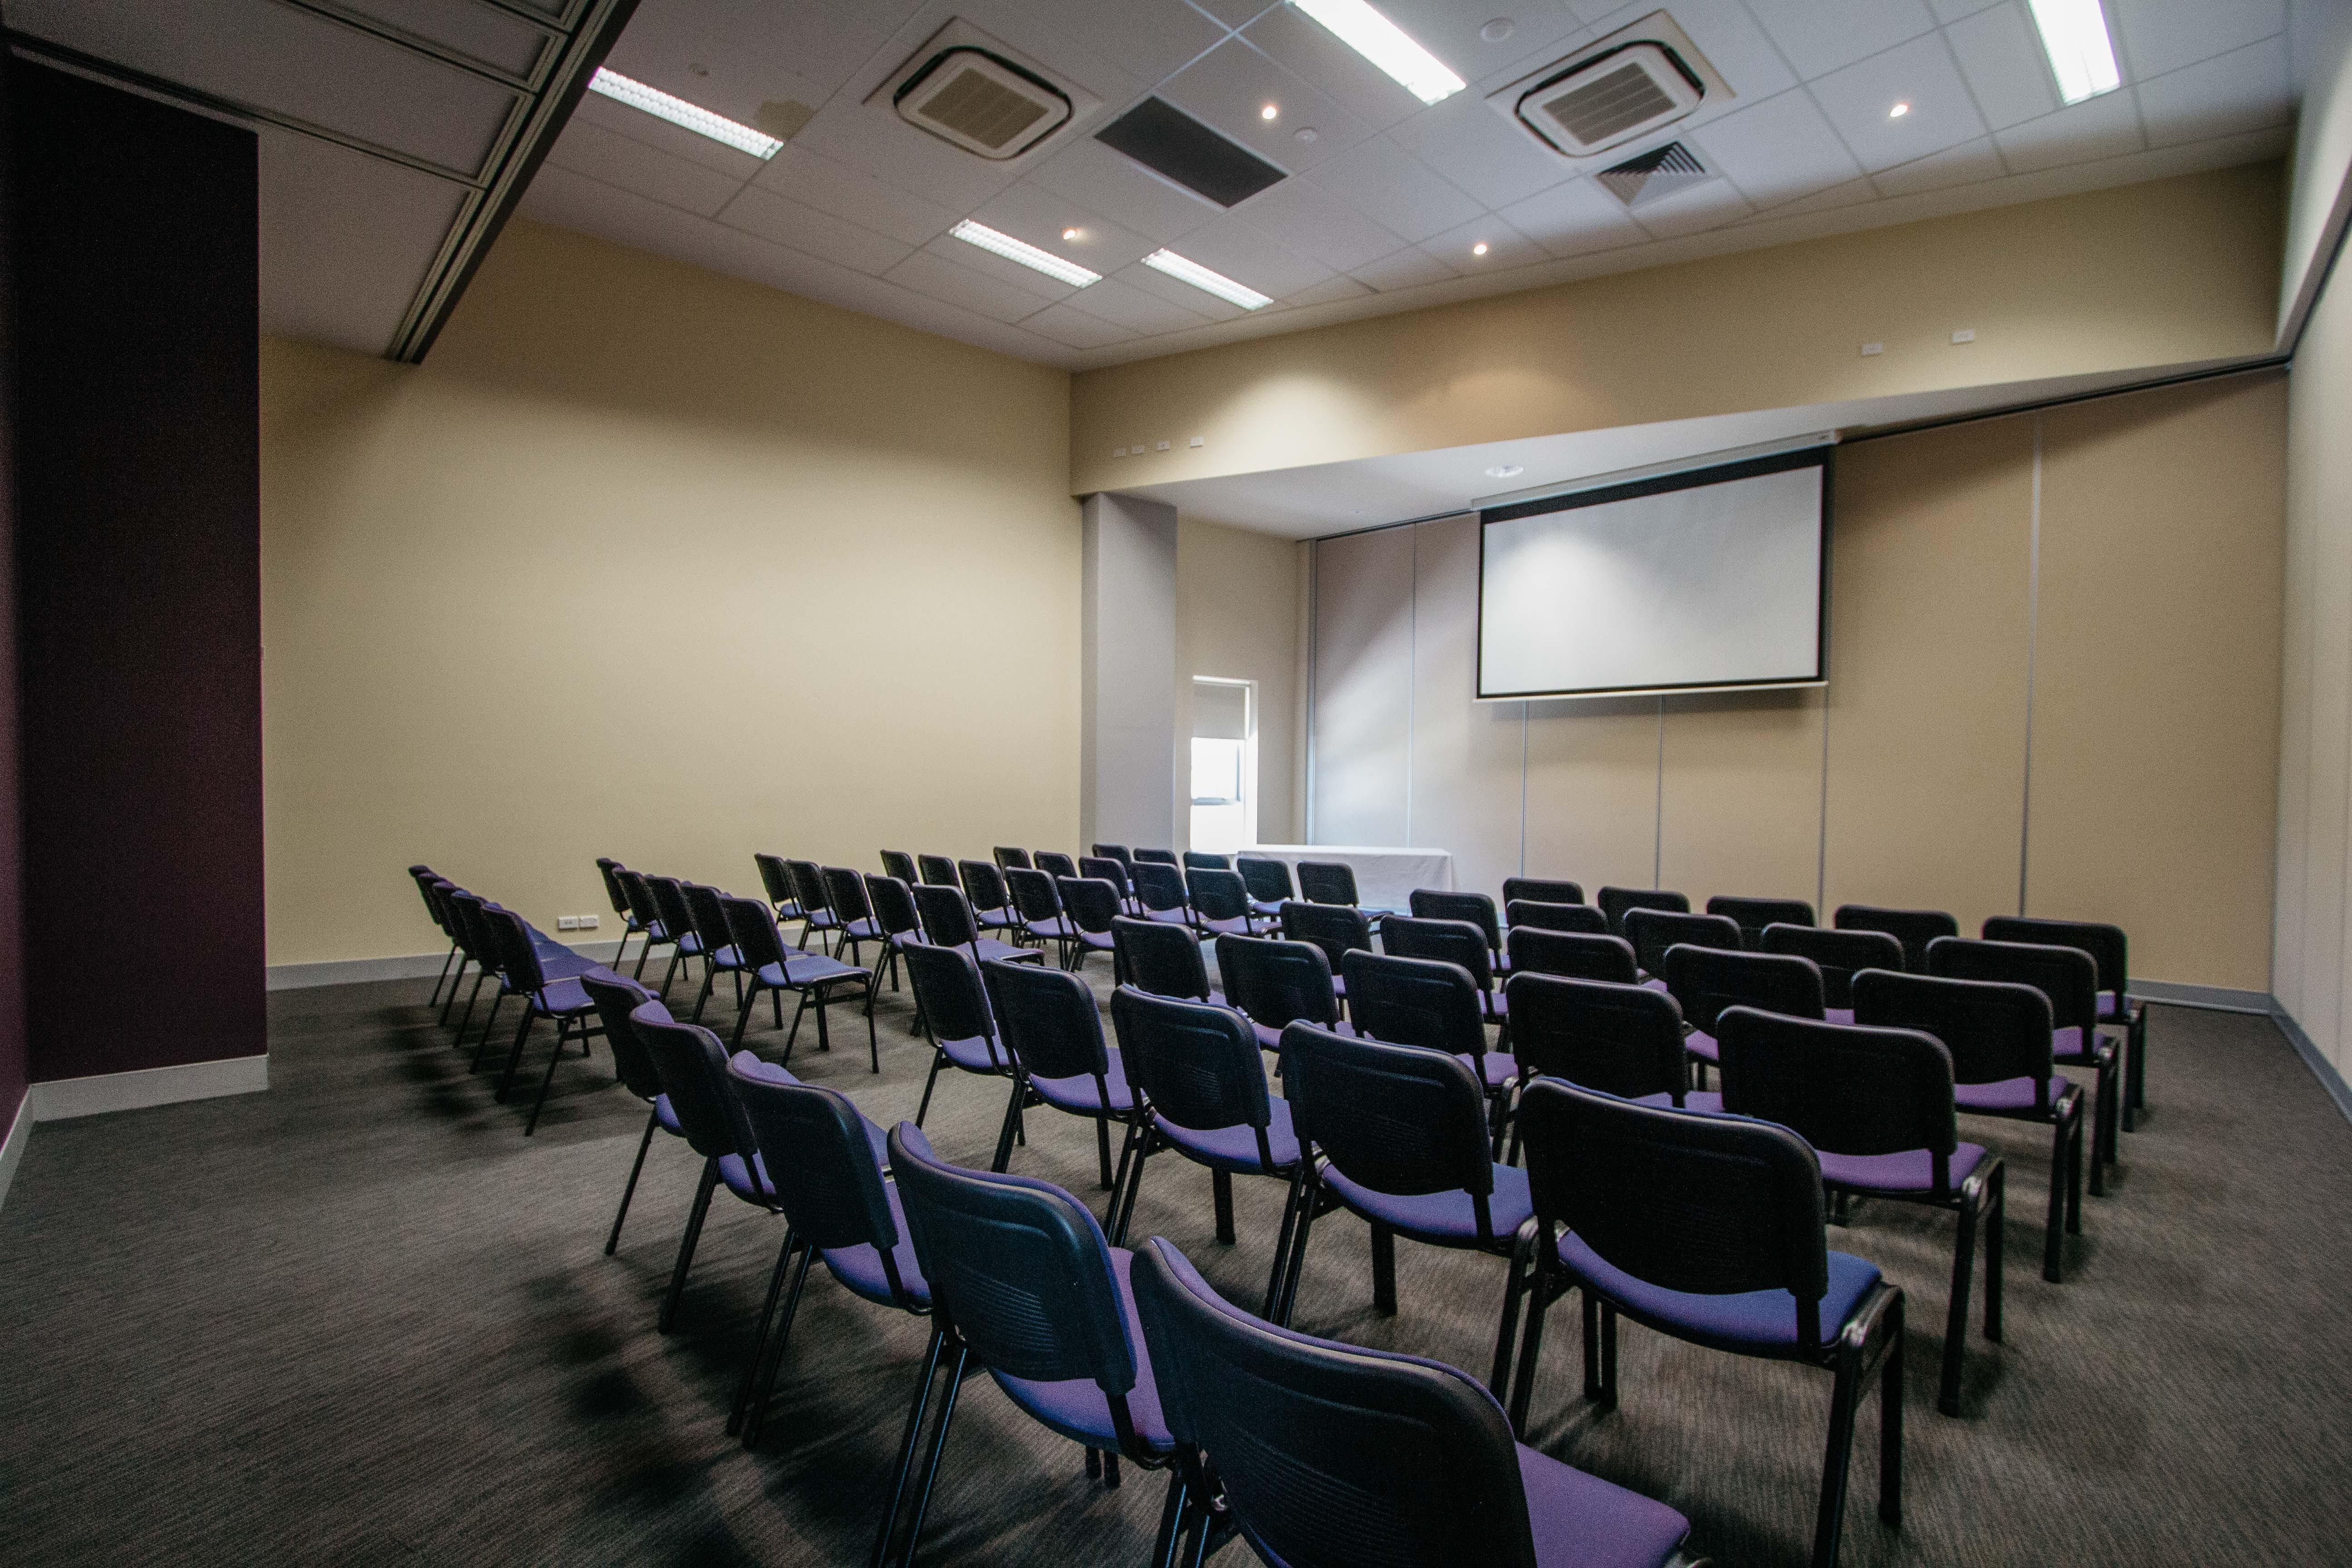 Moriah 1 & 2, multi-use area at Unidus Community Centre, image 1